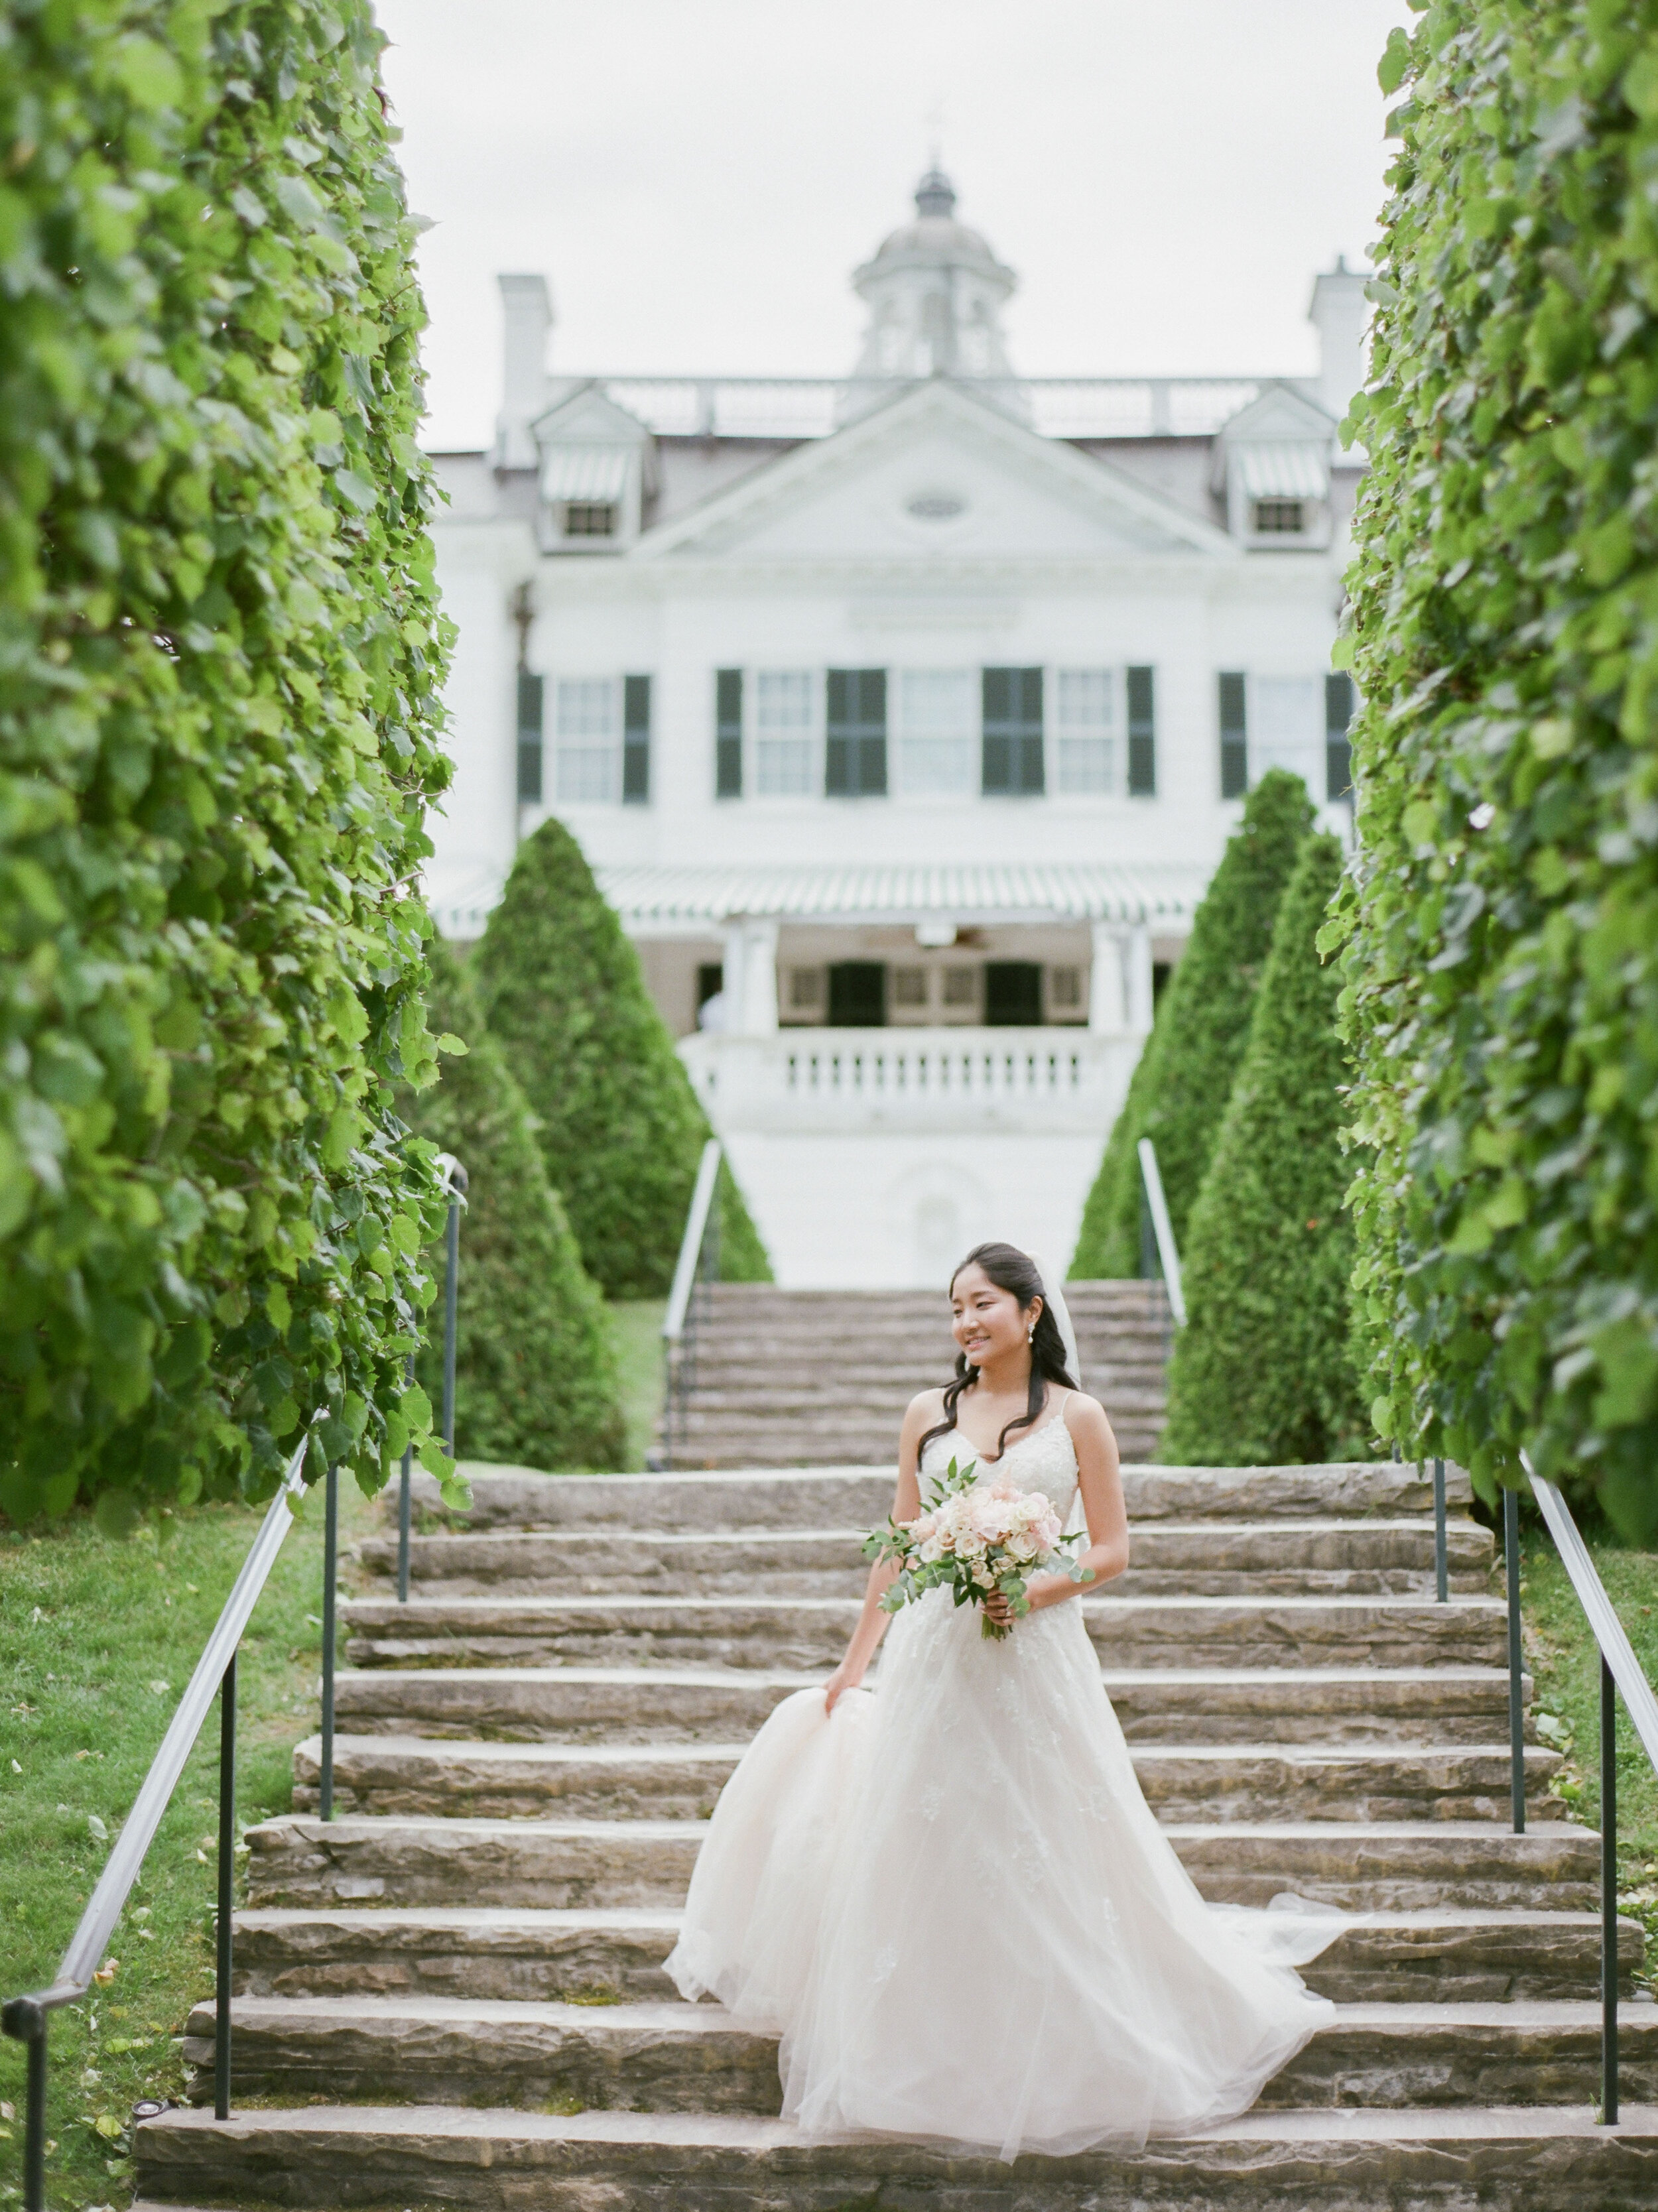 Fine Art Wedding Photography in Western MA